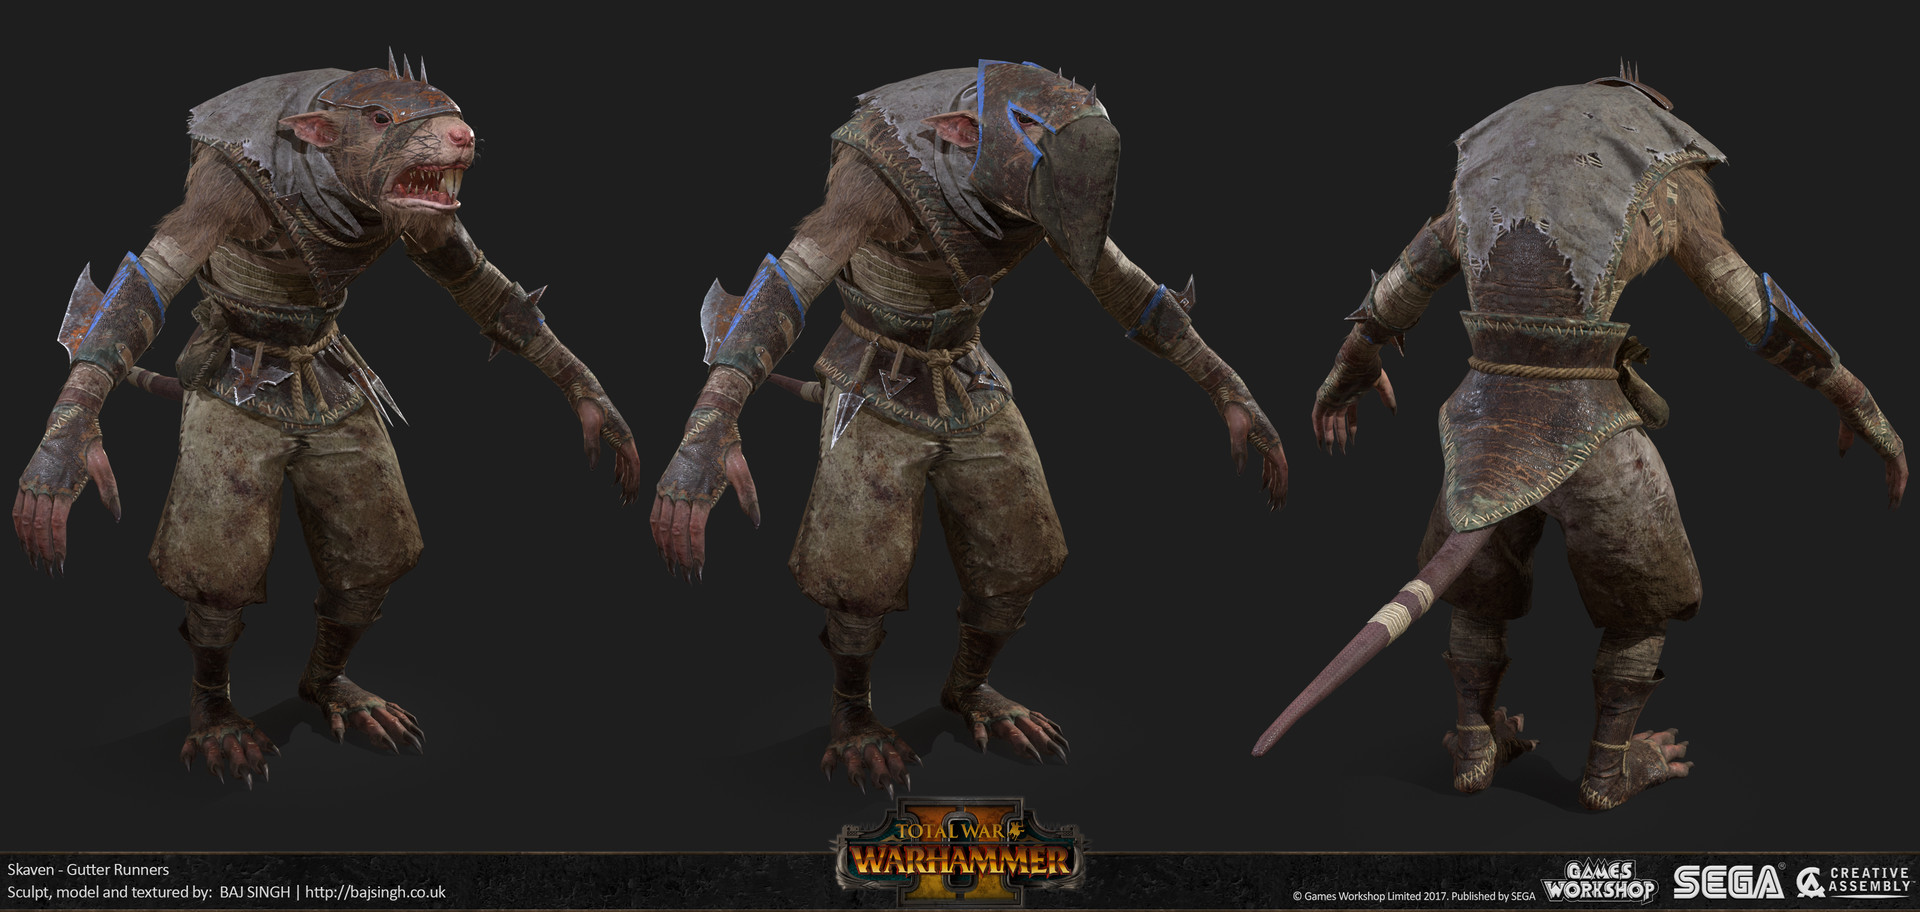 ArtStation - Total War: Warhammer 2 - Skaven Assassin and Runners